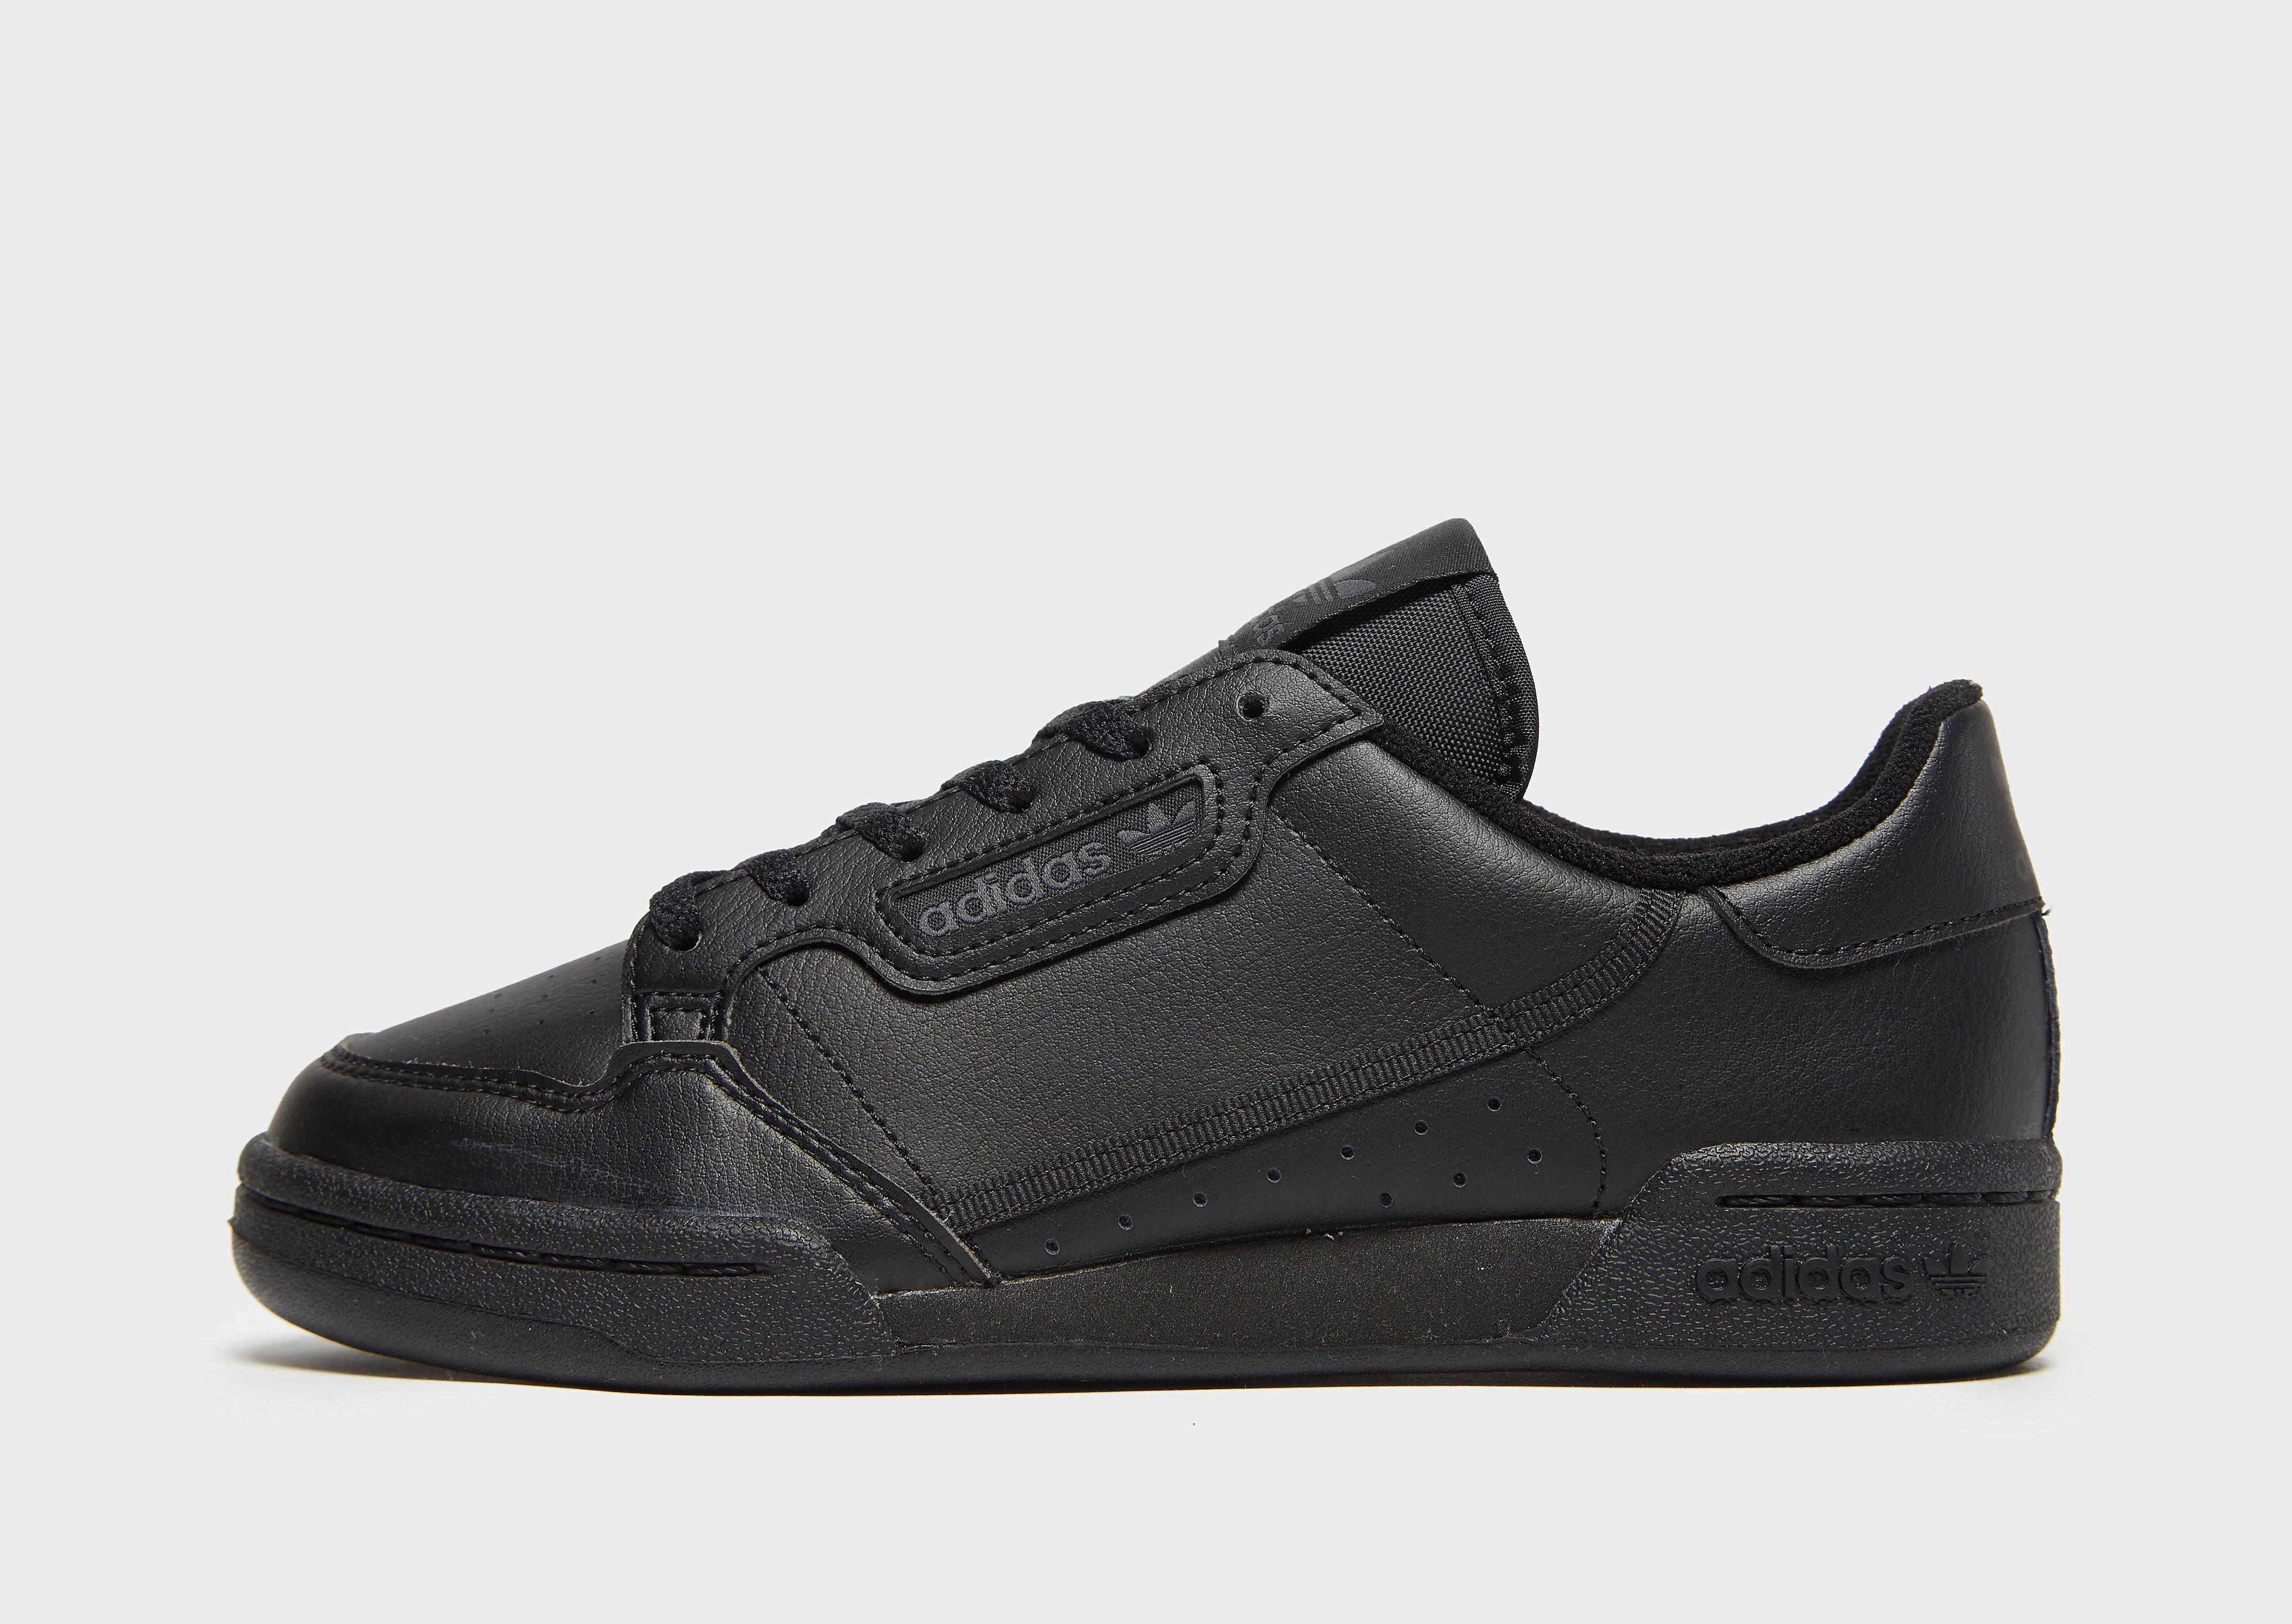 size 40 75812 67fad Negro. Sneaker Adidas adidas Originals Continental 80 júnior